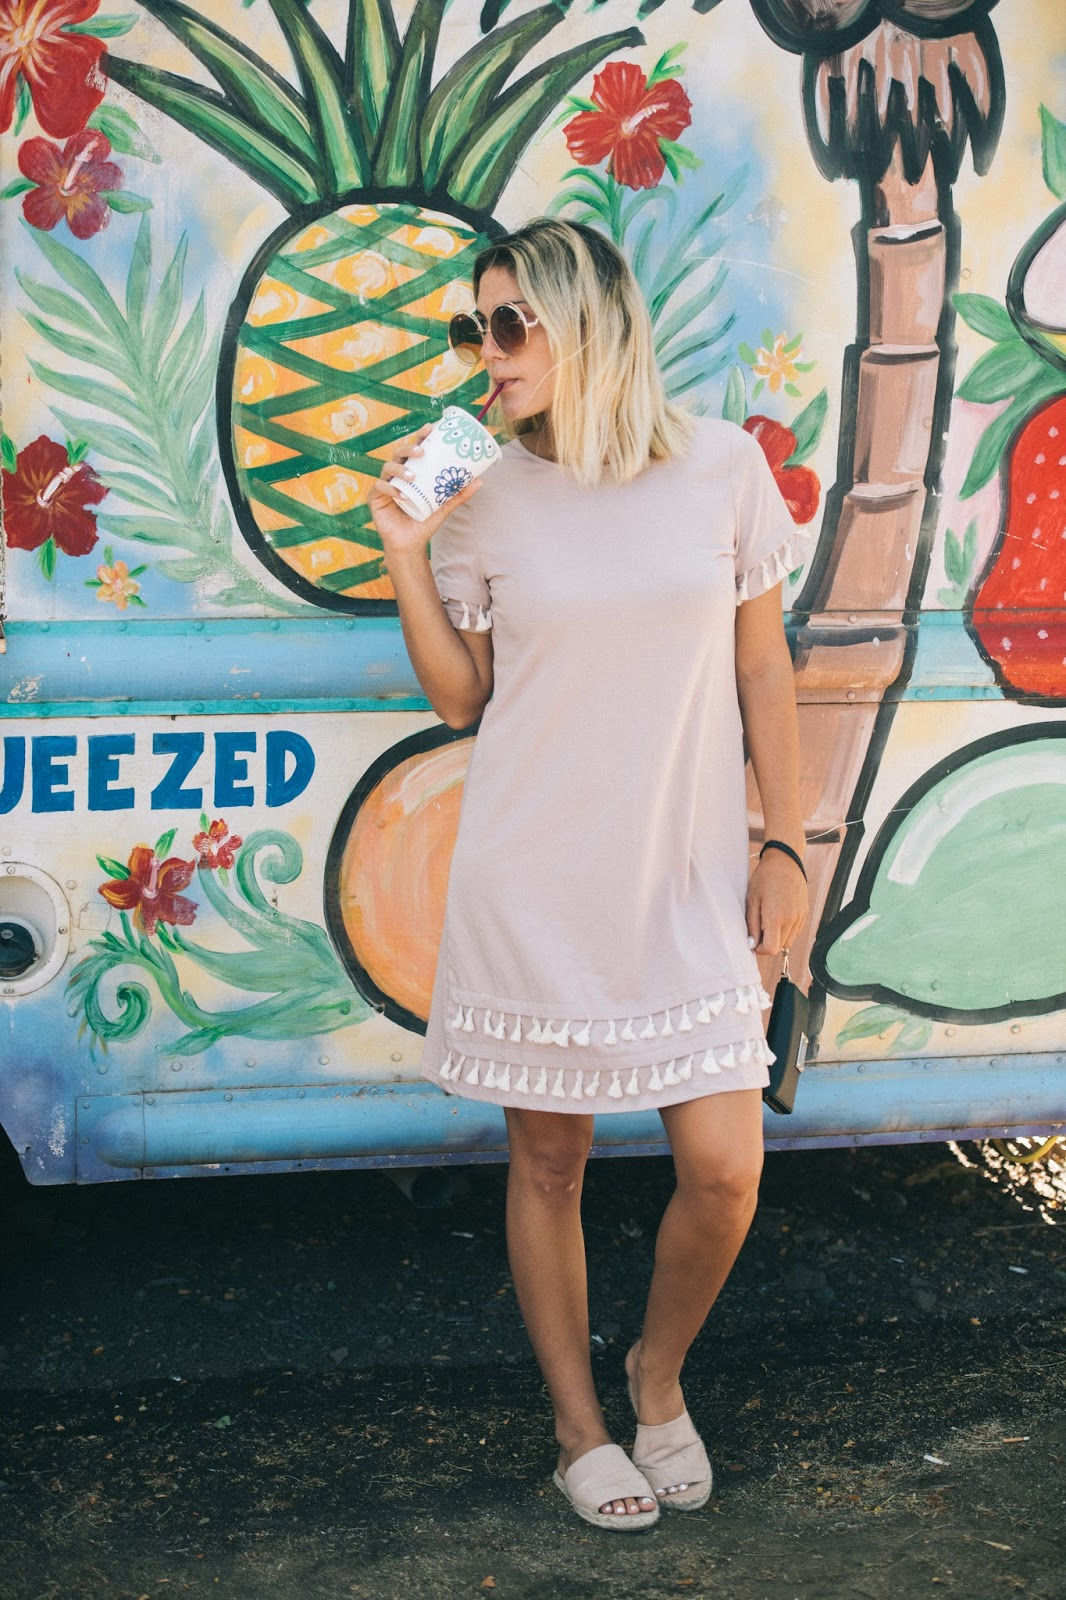 Tassel Dress - @taylorwinkelmeyer MyCupofChic.com